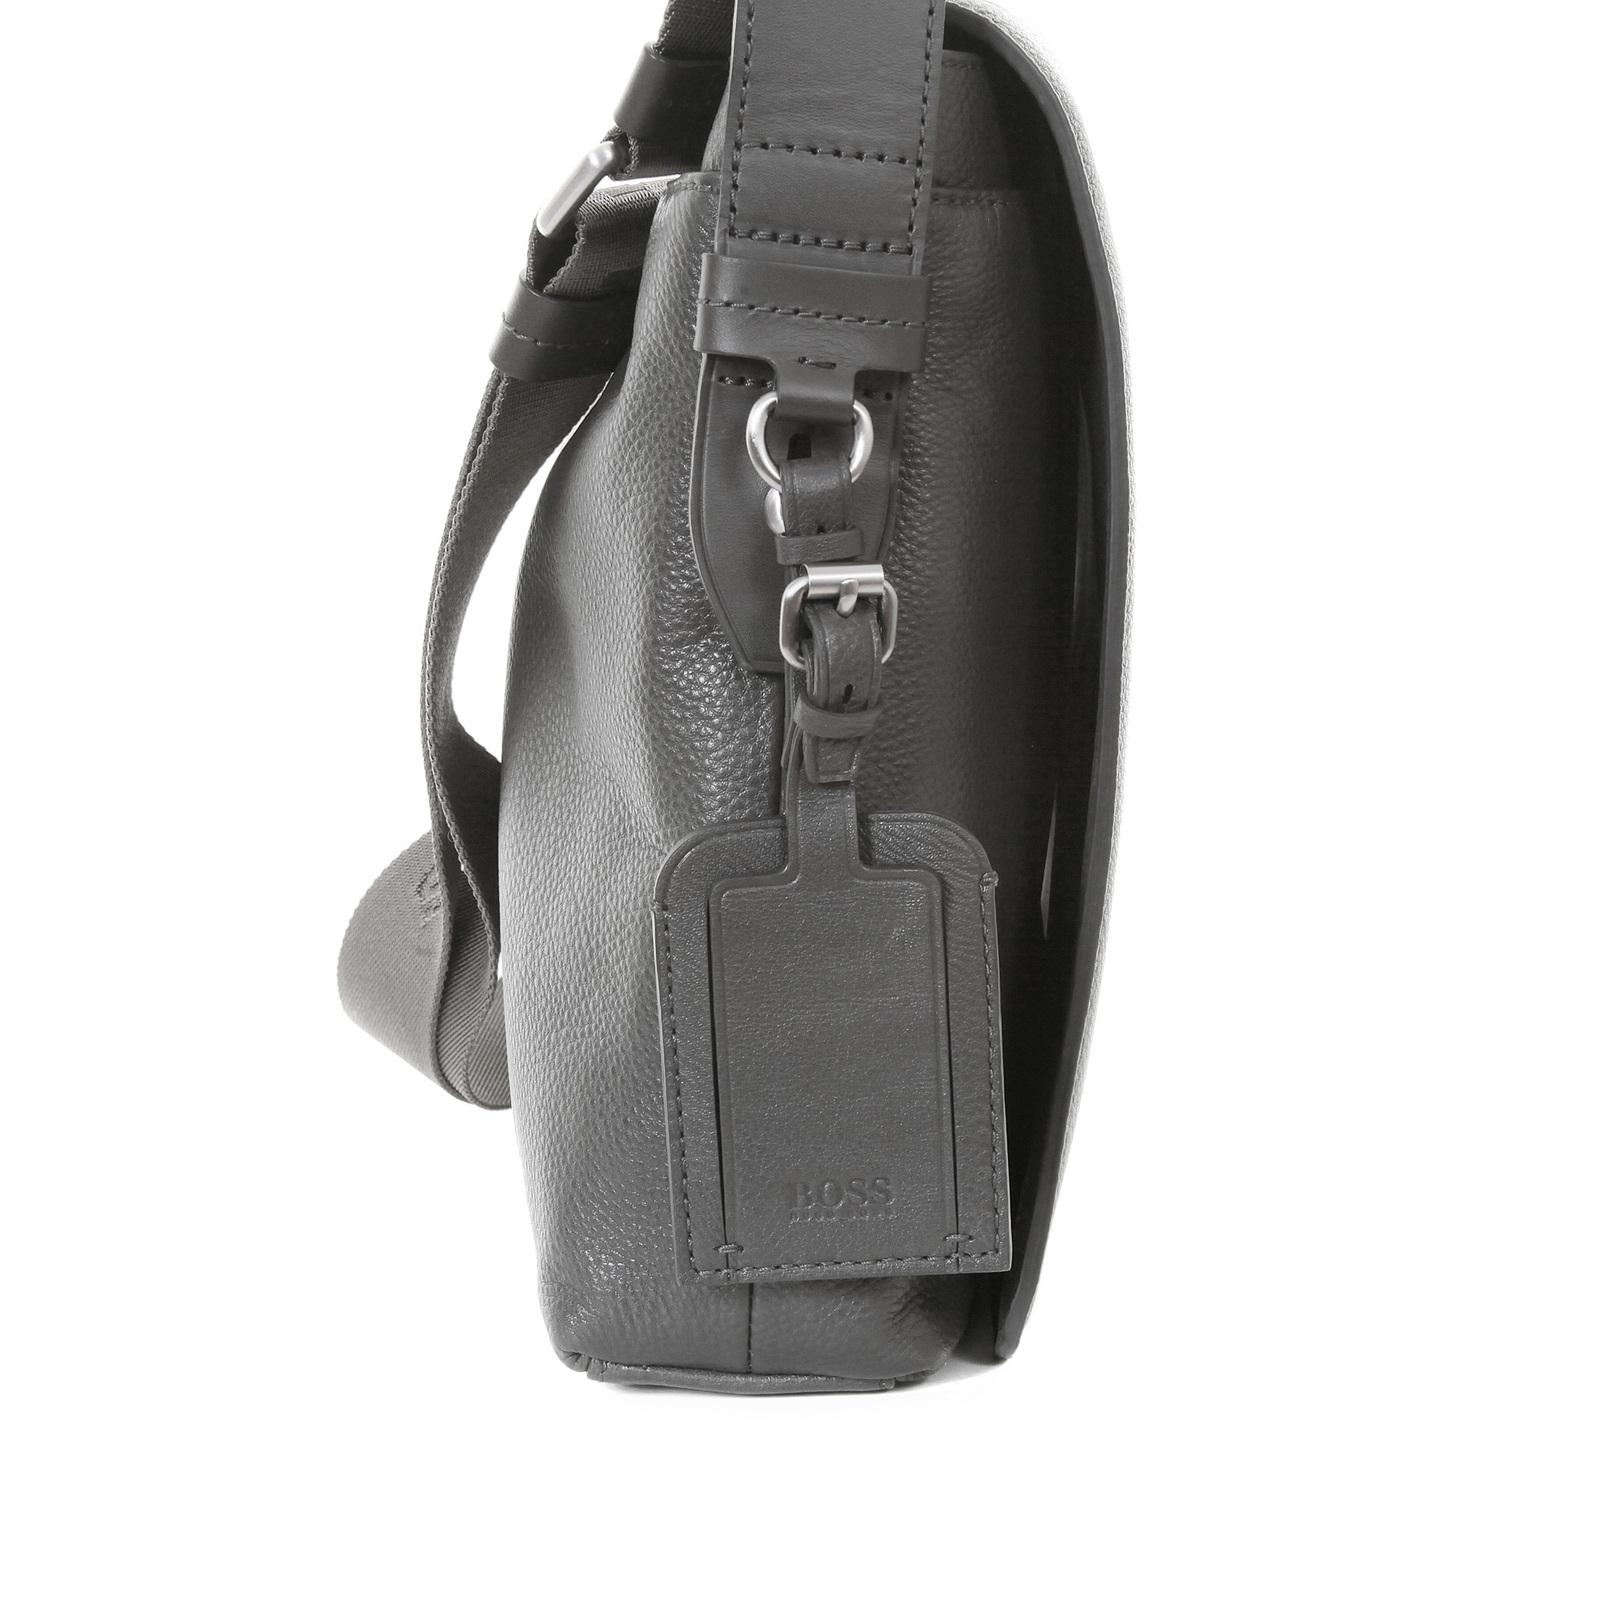 a995eaf2a2 Hugo Boss Black label mens grey leather 50205405 Bekon reporter bag BOSS0973